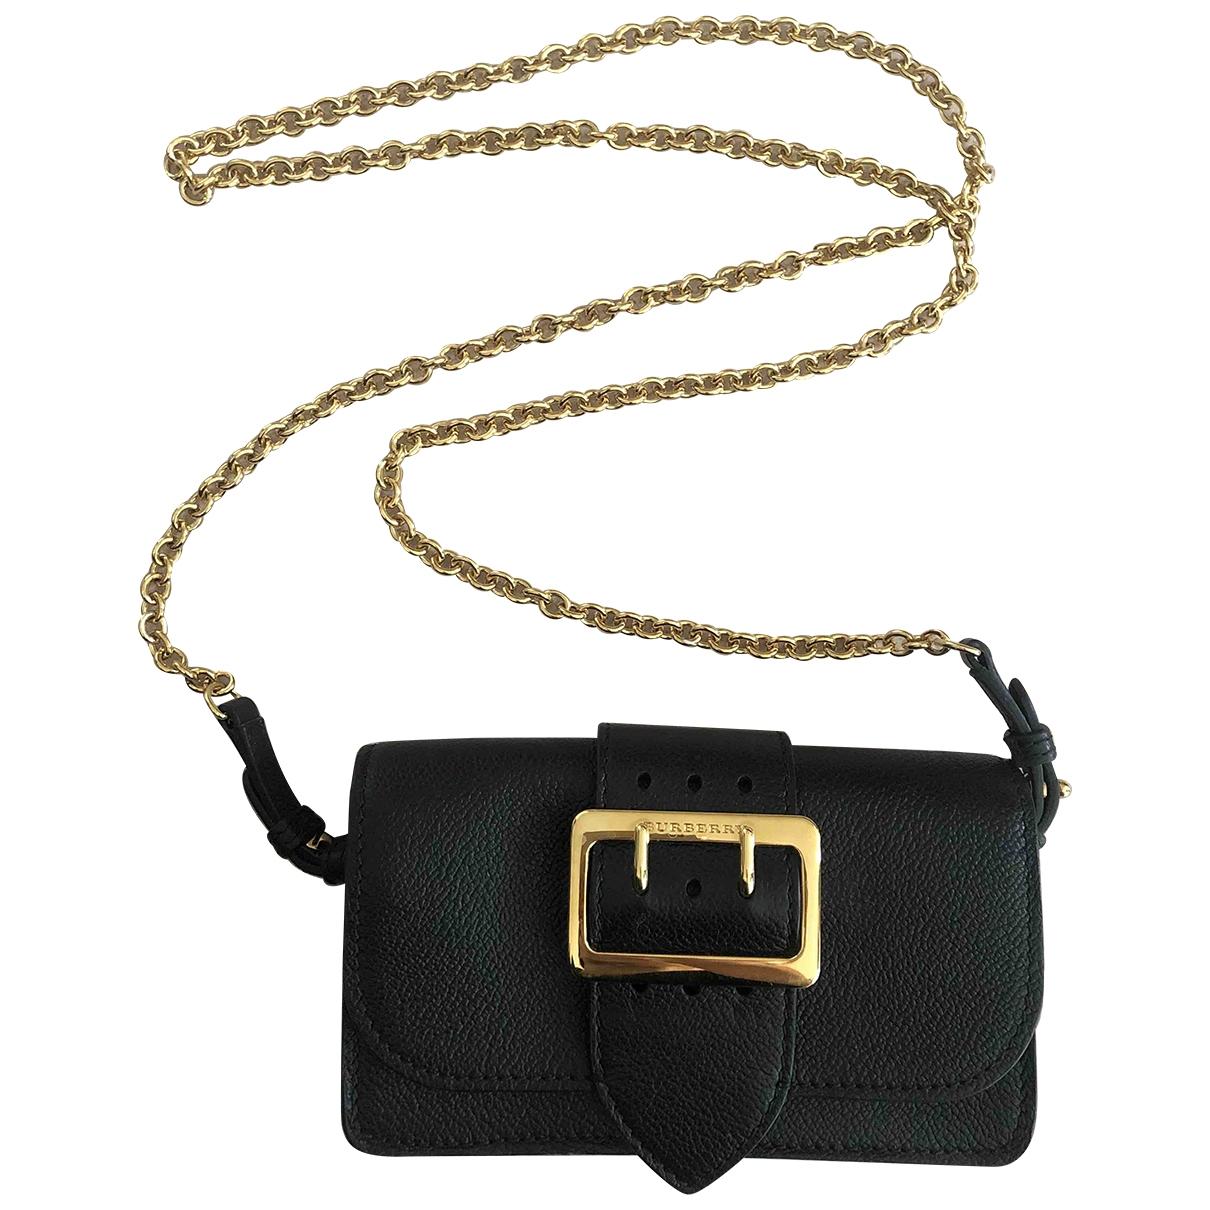 Burberry \N Black Leather Clutch bag for Women \N